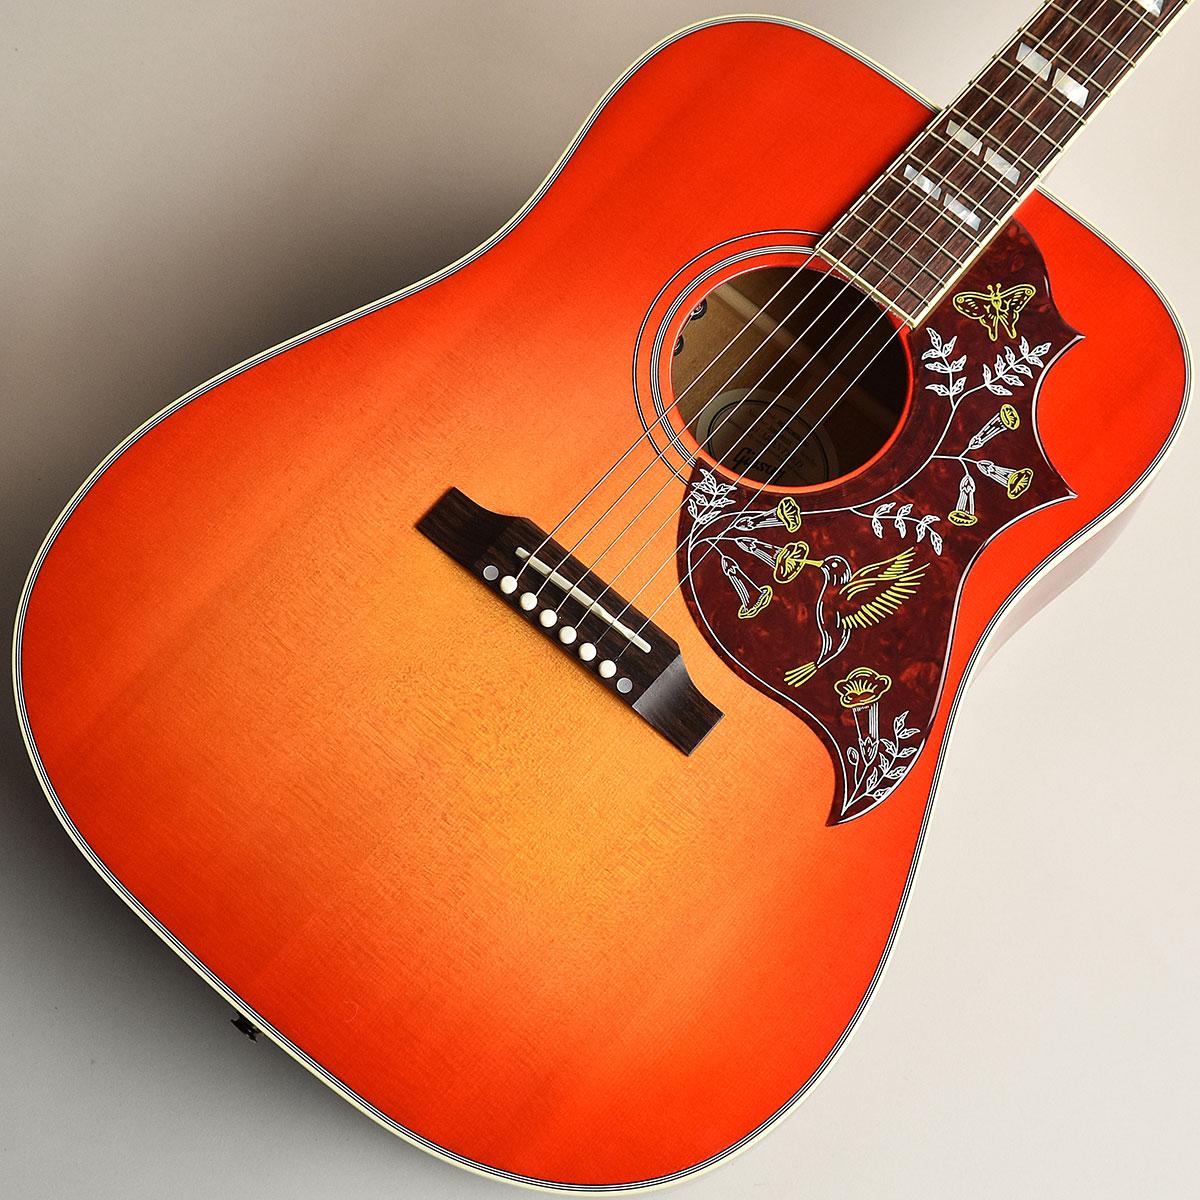 Gibson Hummingbird 2019 Vintage Cherry Sunburst S/N:10849033 エレアコ 【ギブソン ハミングバード】【未展示品】